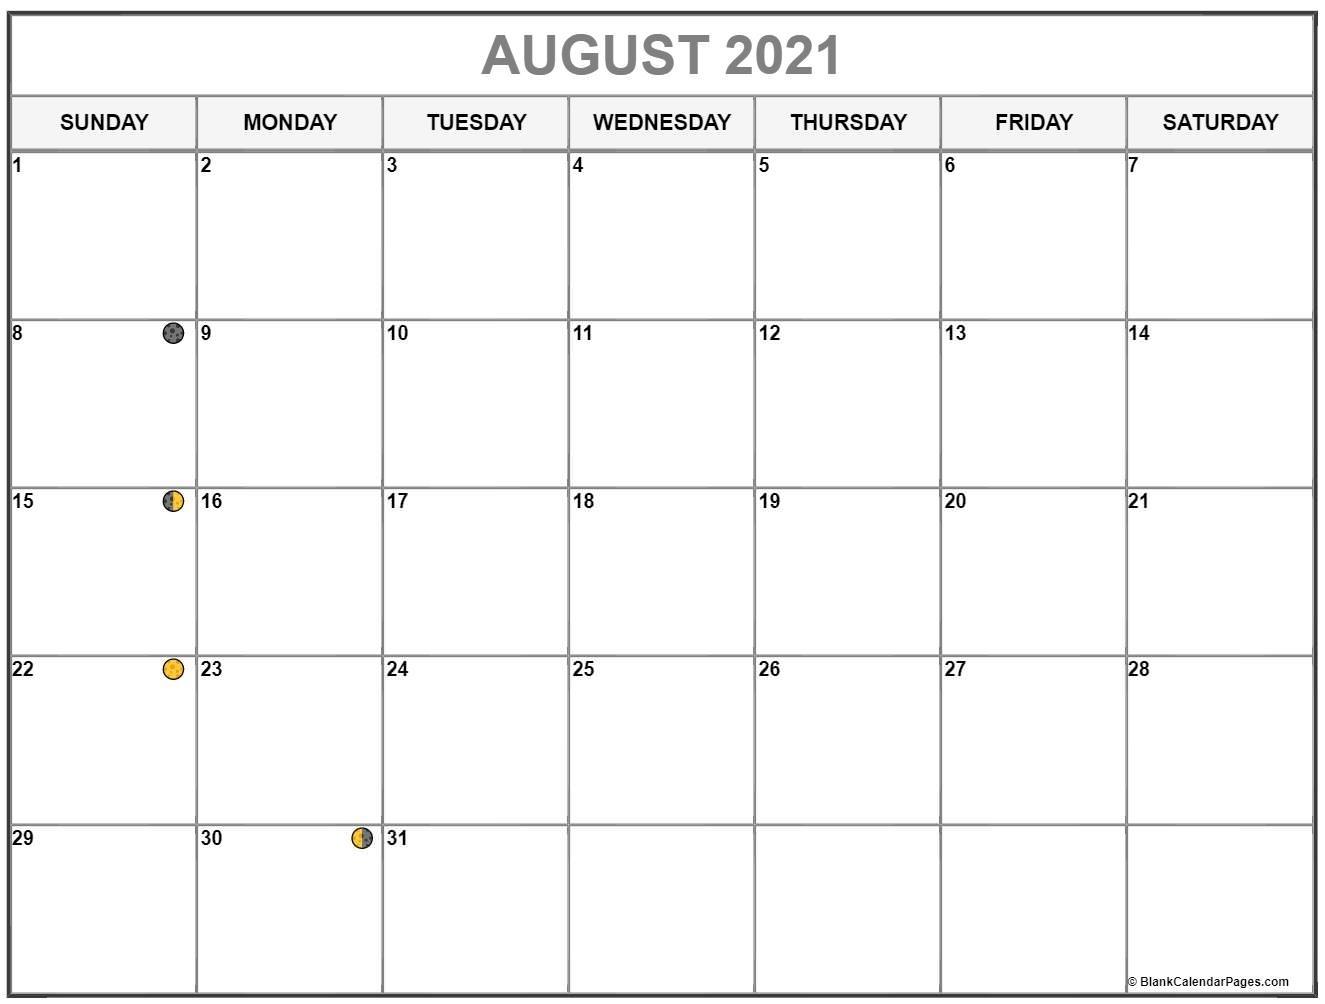 August 2021 Lunar Calendar   Moon Phase Calendar Blank August 2021 Calendar